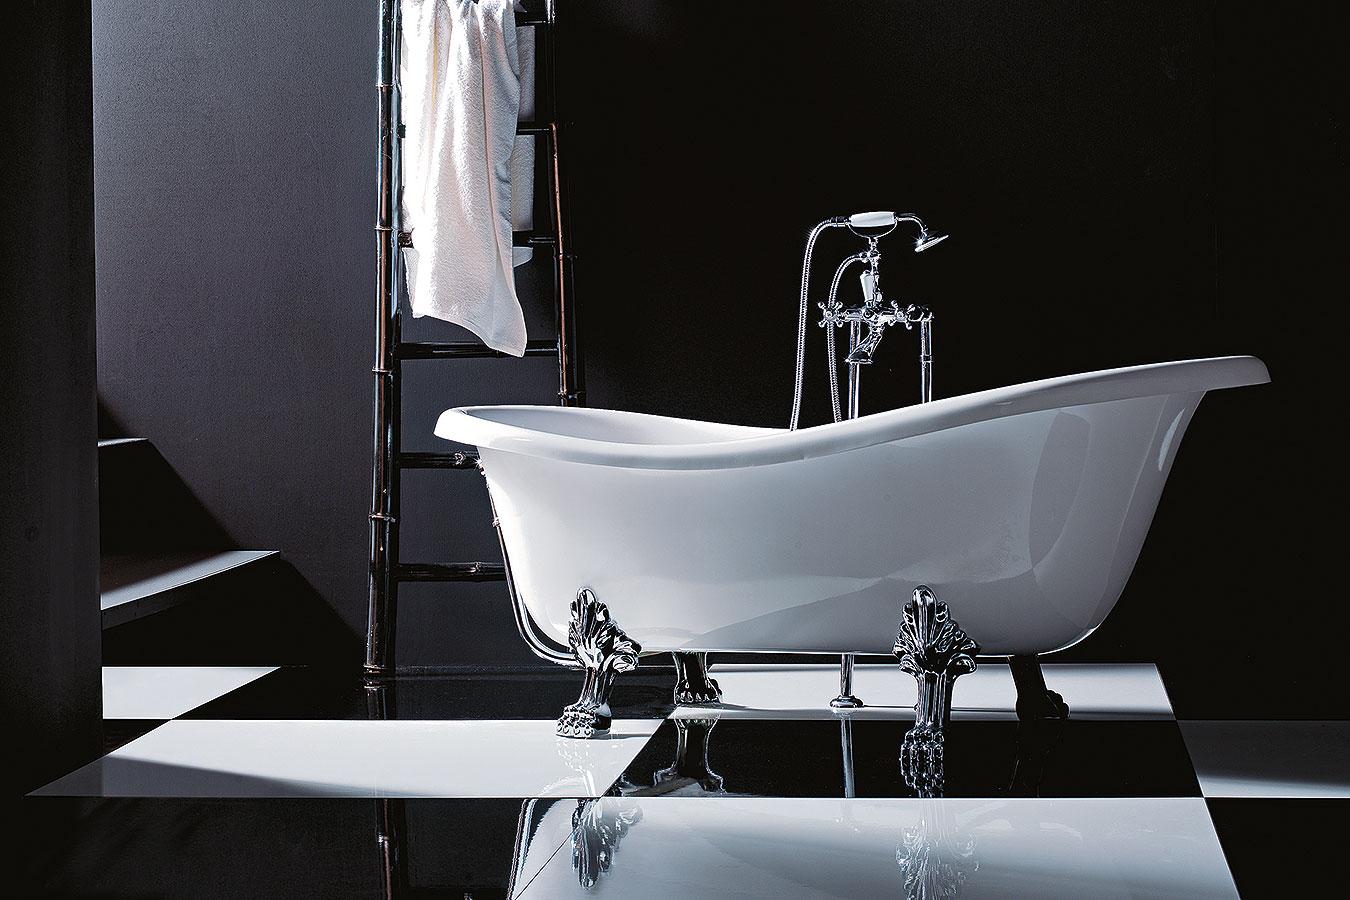 Bagno con vasca e doccia insieme treesse vasche vasche da - Cabina per vasca da bagno ...